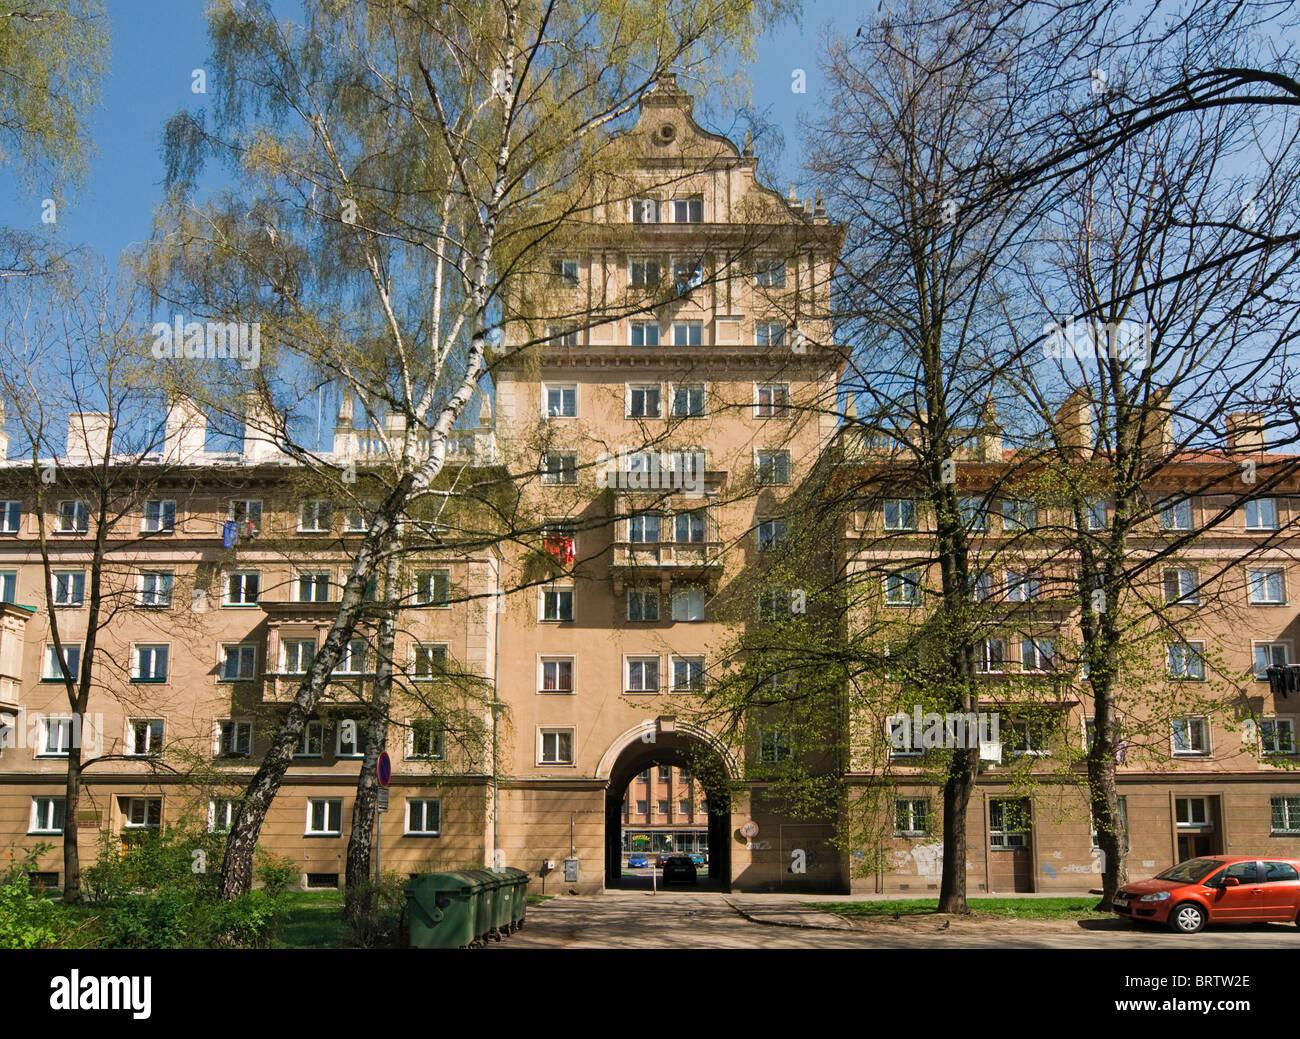 Apartment Building Built in Socialist Realism Architecture Style in 1950s, Poruba District of Ostrava, Czech Republic - Stock Image